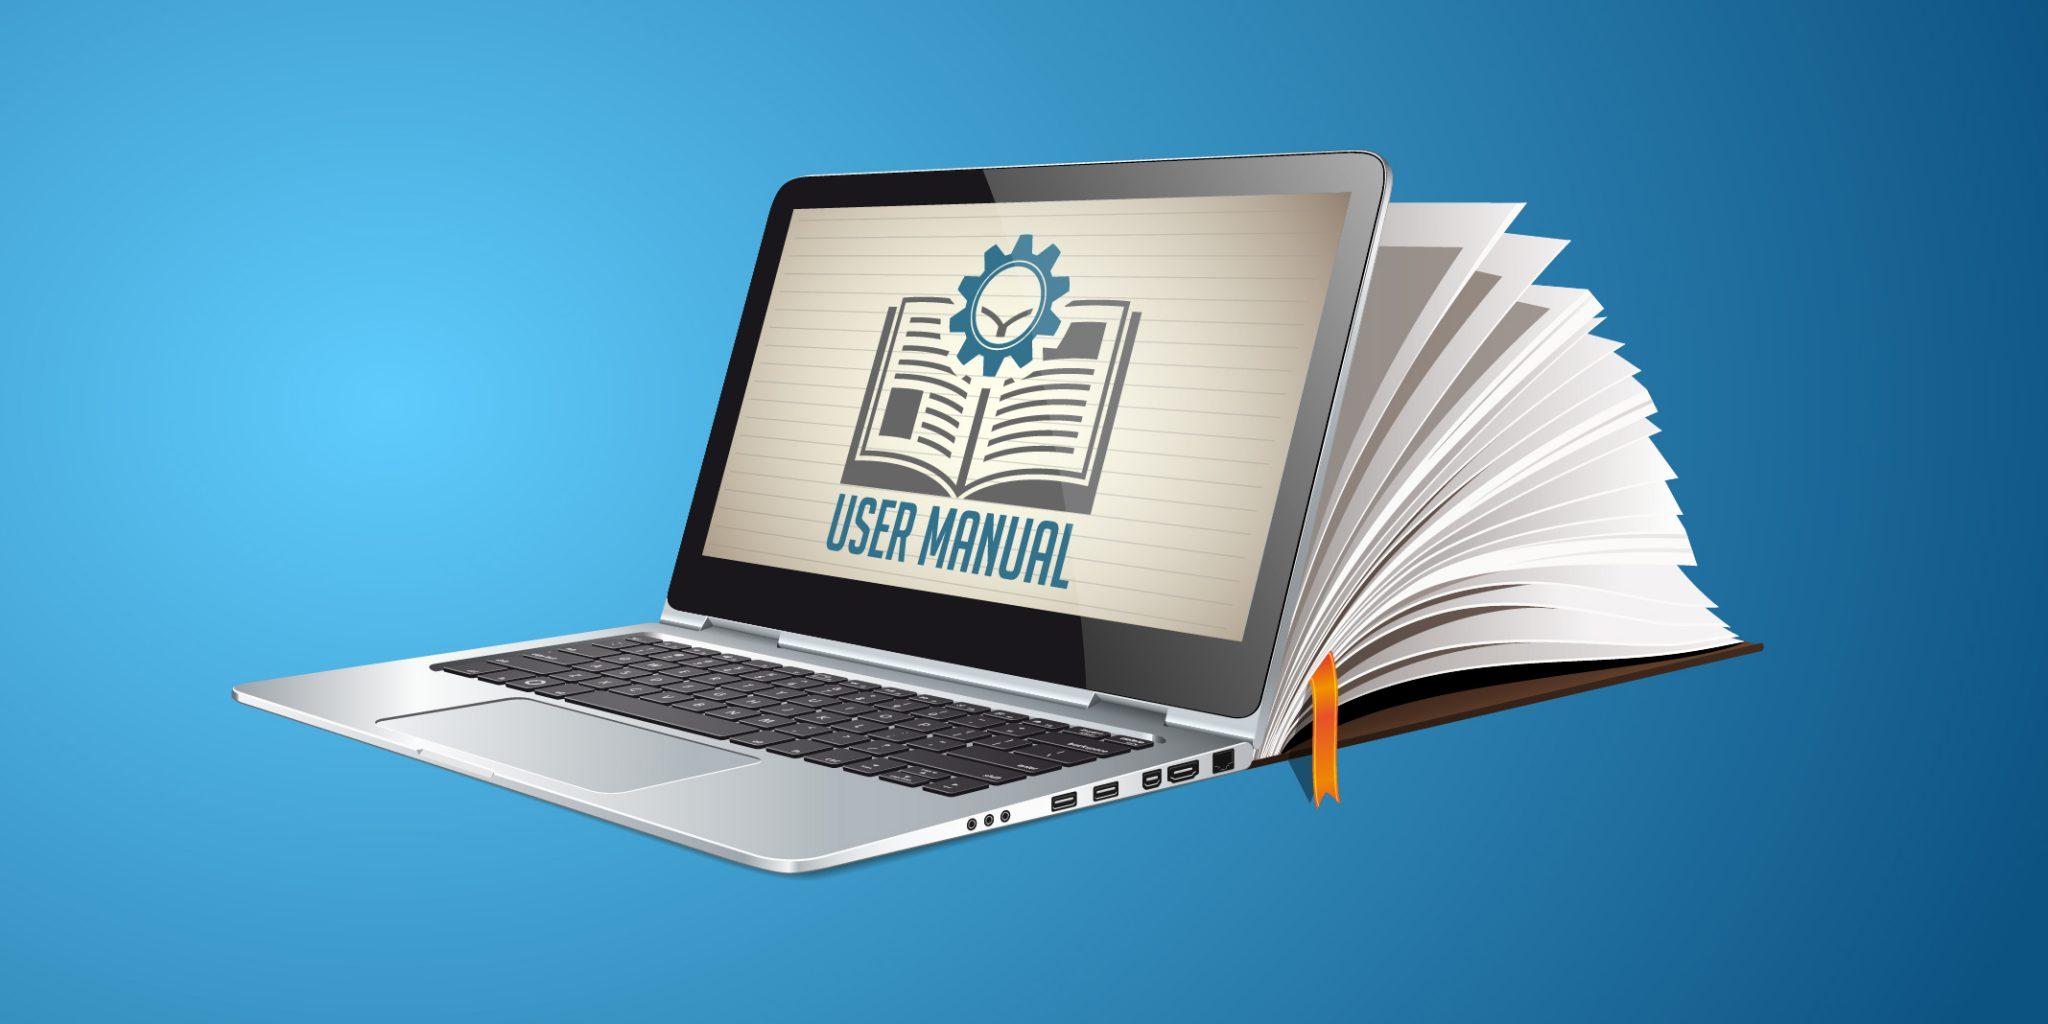 Digital Publishing market